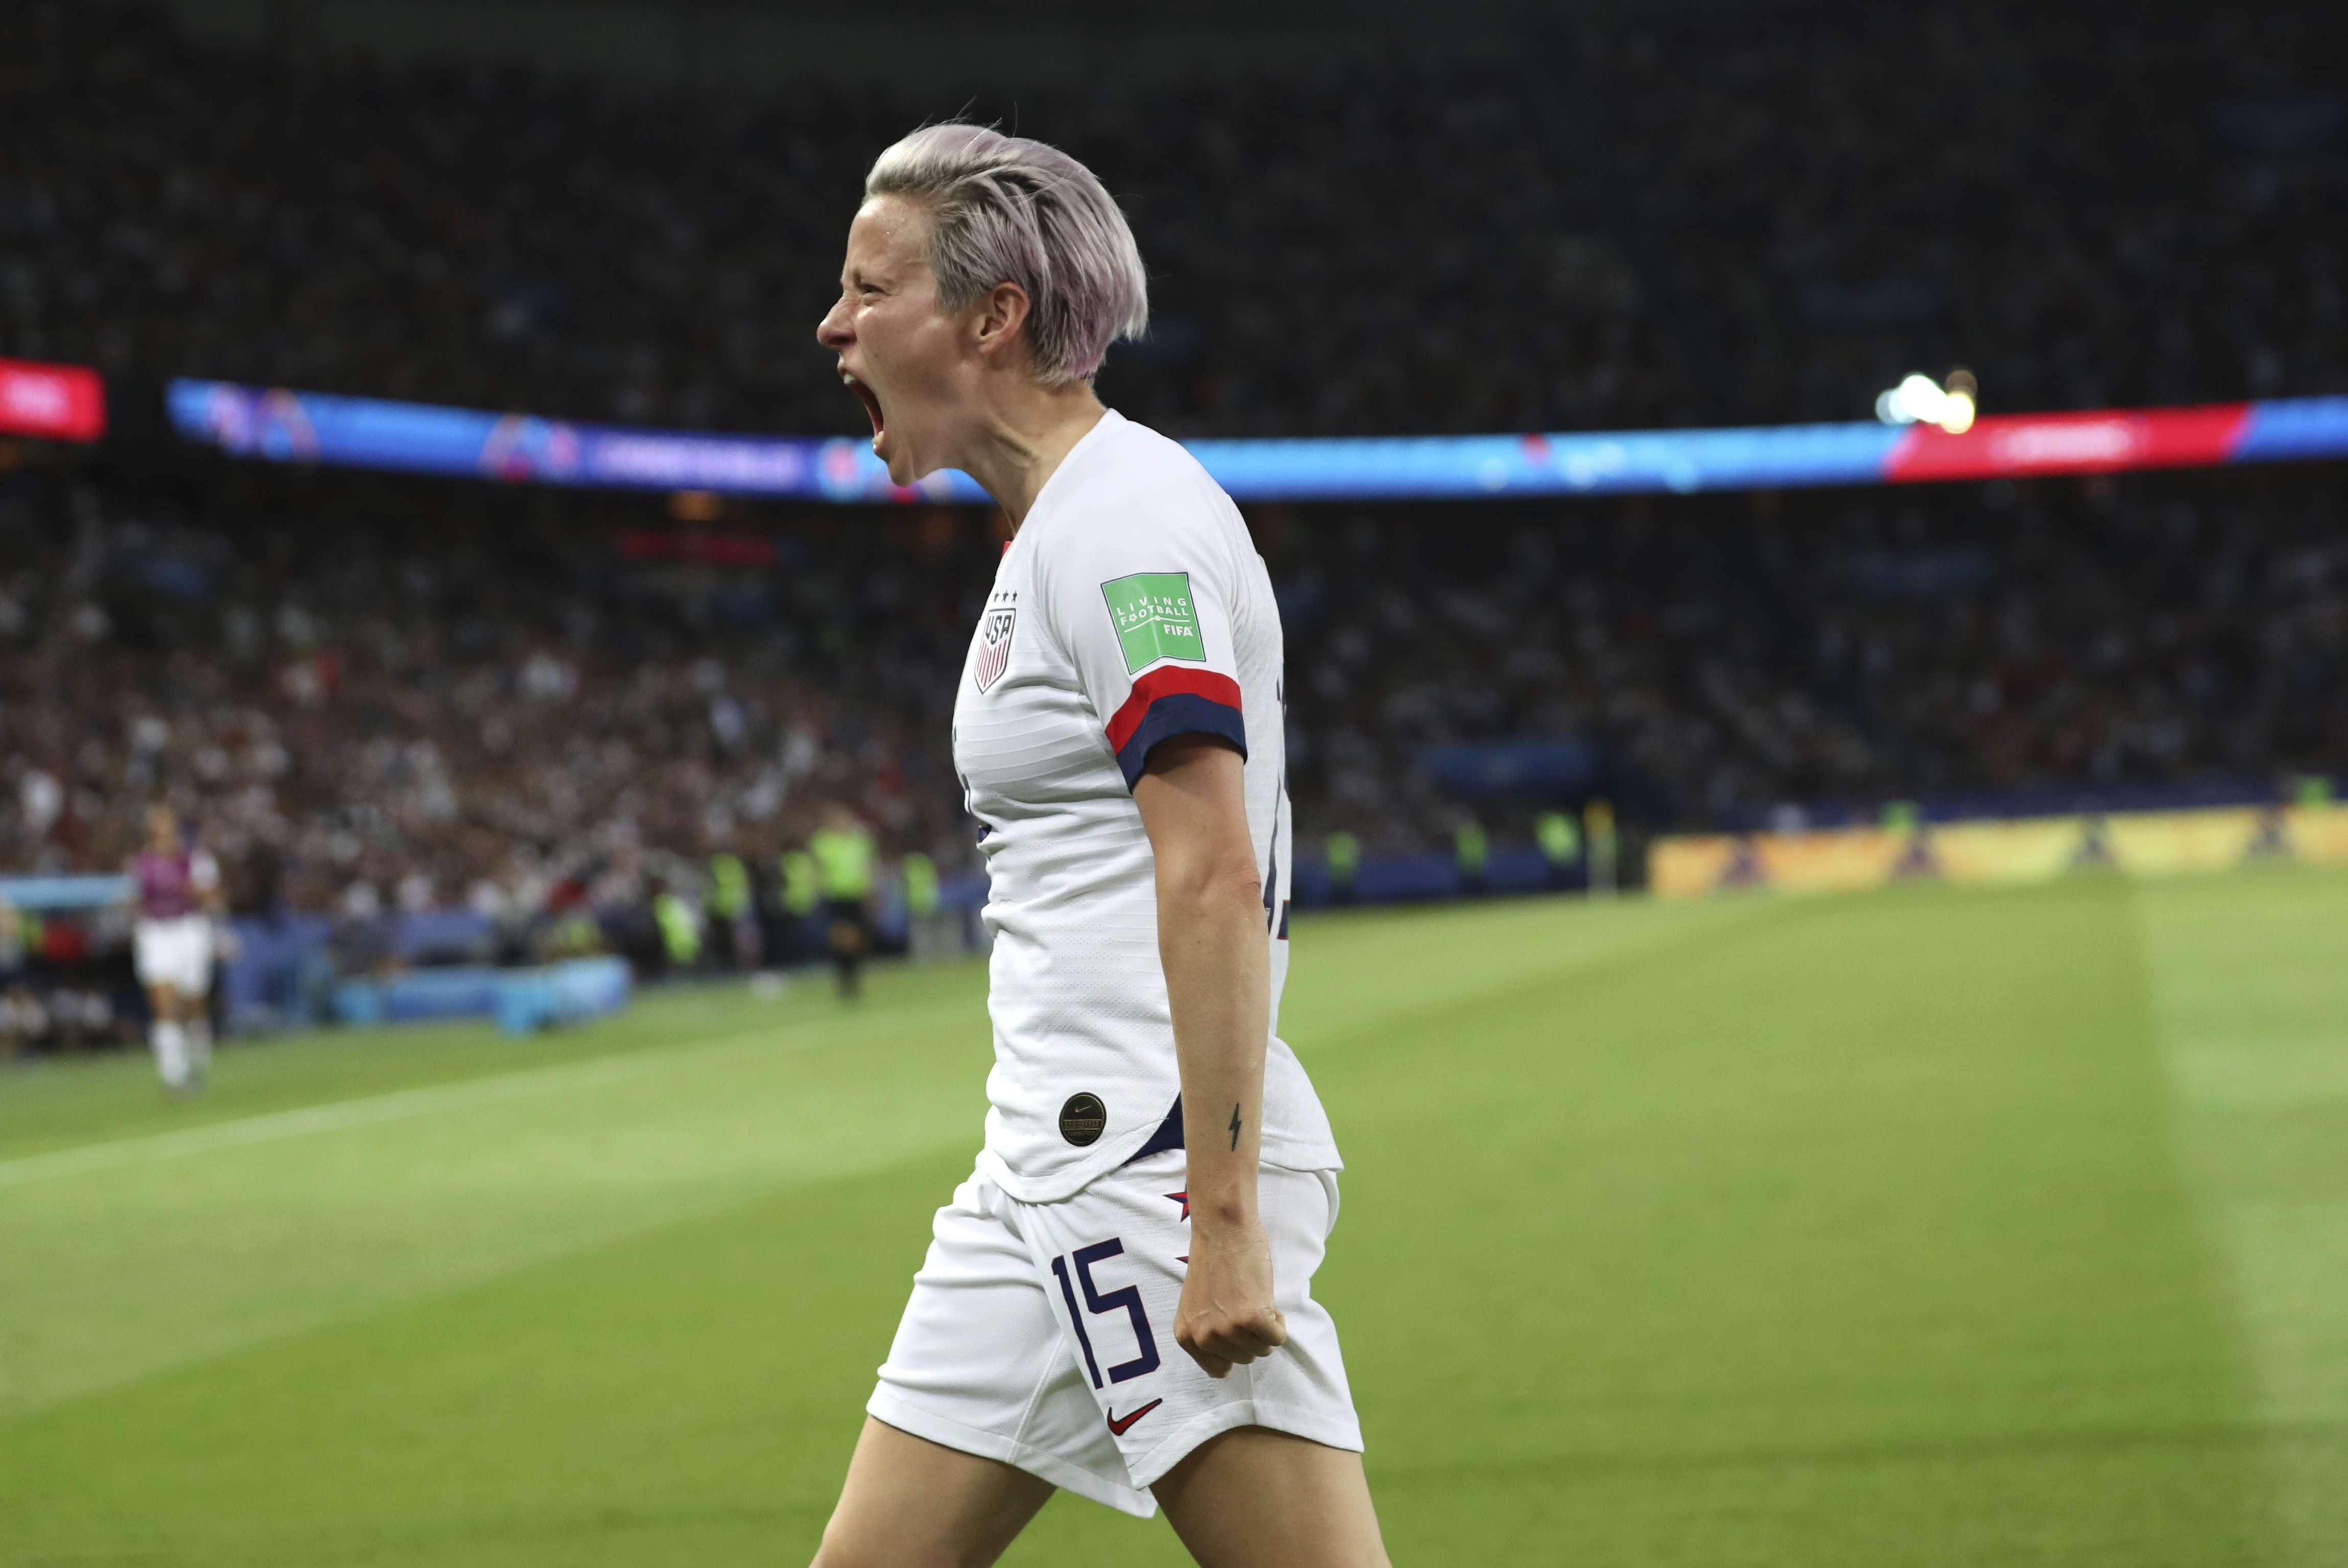 ¿Nuevo insulto? Mundial femenino compite con otras 2 finales